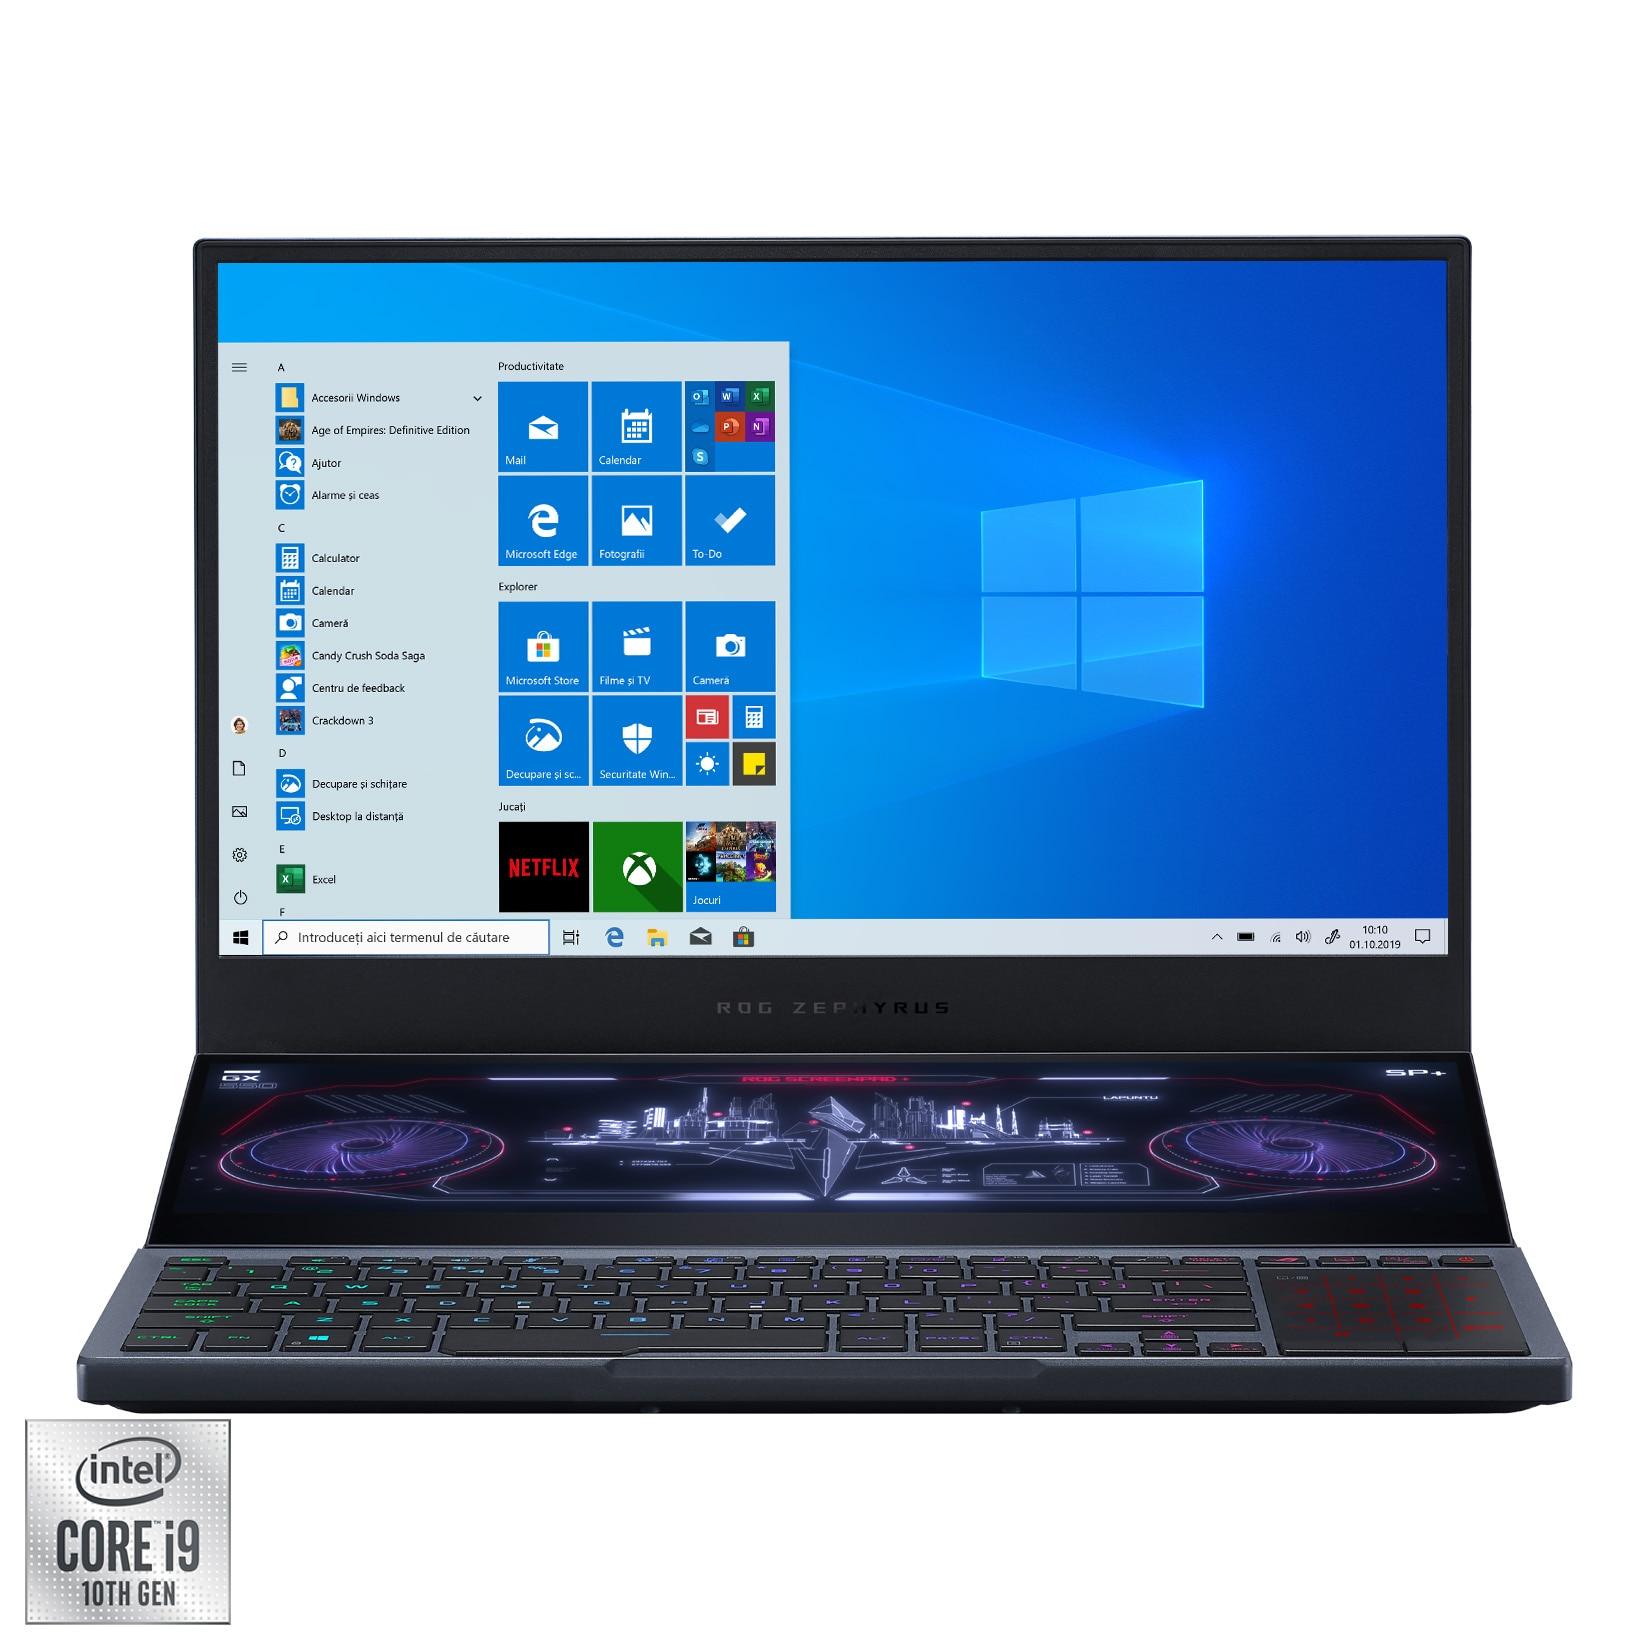 "Fotografie Laptop Gaming ASUS ROG Zephyrus Duo 15 GX550LXS cu procesor Intel® Core™ i9-10980HK pana la 5.30 GHz, 15.6"", Full HD, 300Hz, 32GB, 1TB SSD, NVIDIA® GeForce® RTX 2080 SUPER™ Max-Q 8GB, Windows 10 Home, Gunmetal Gray"